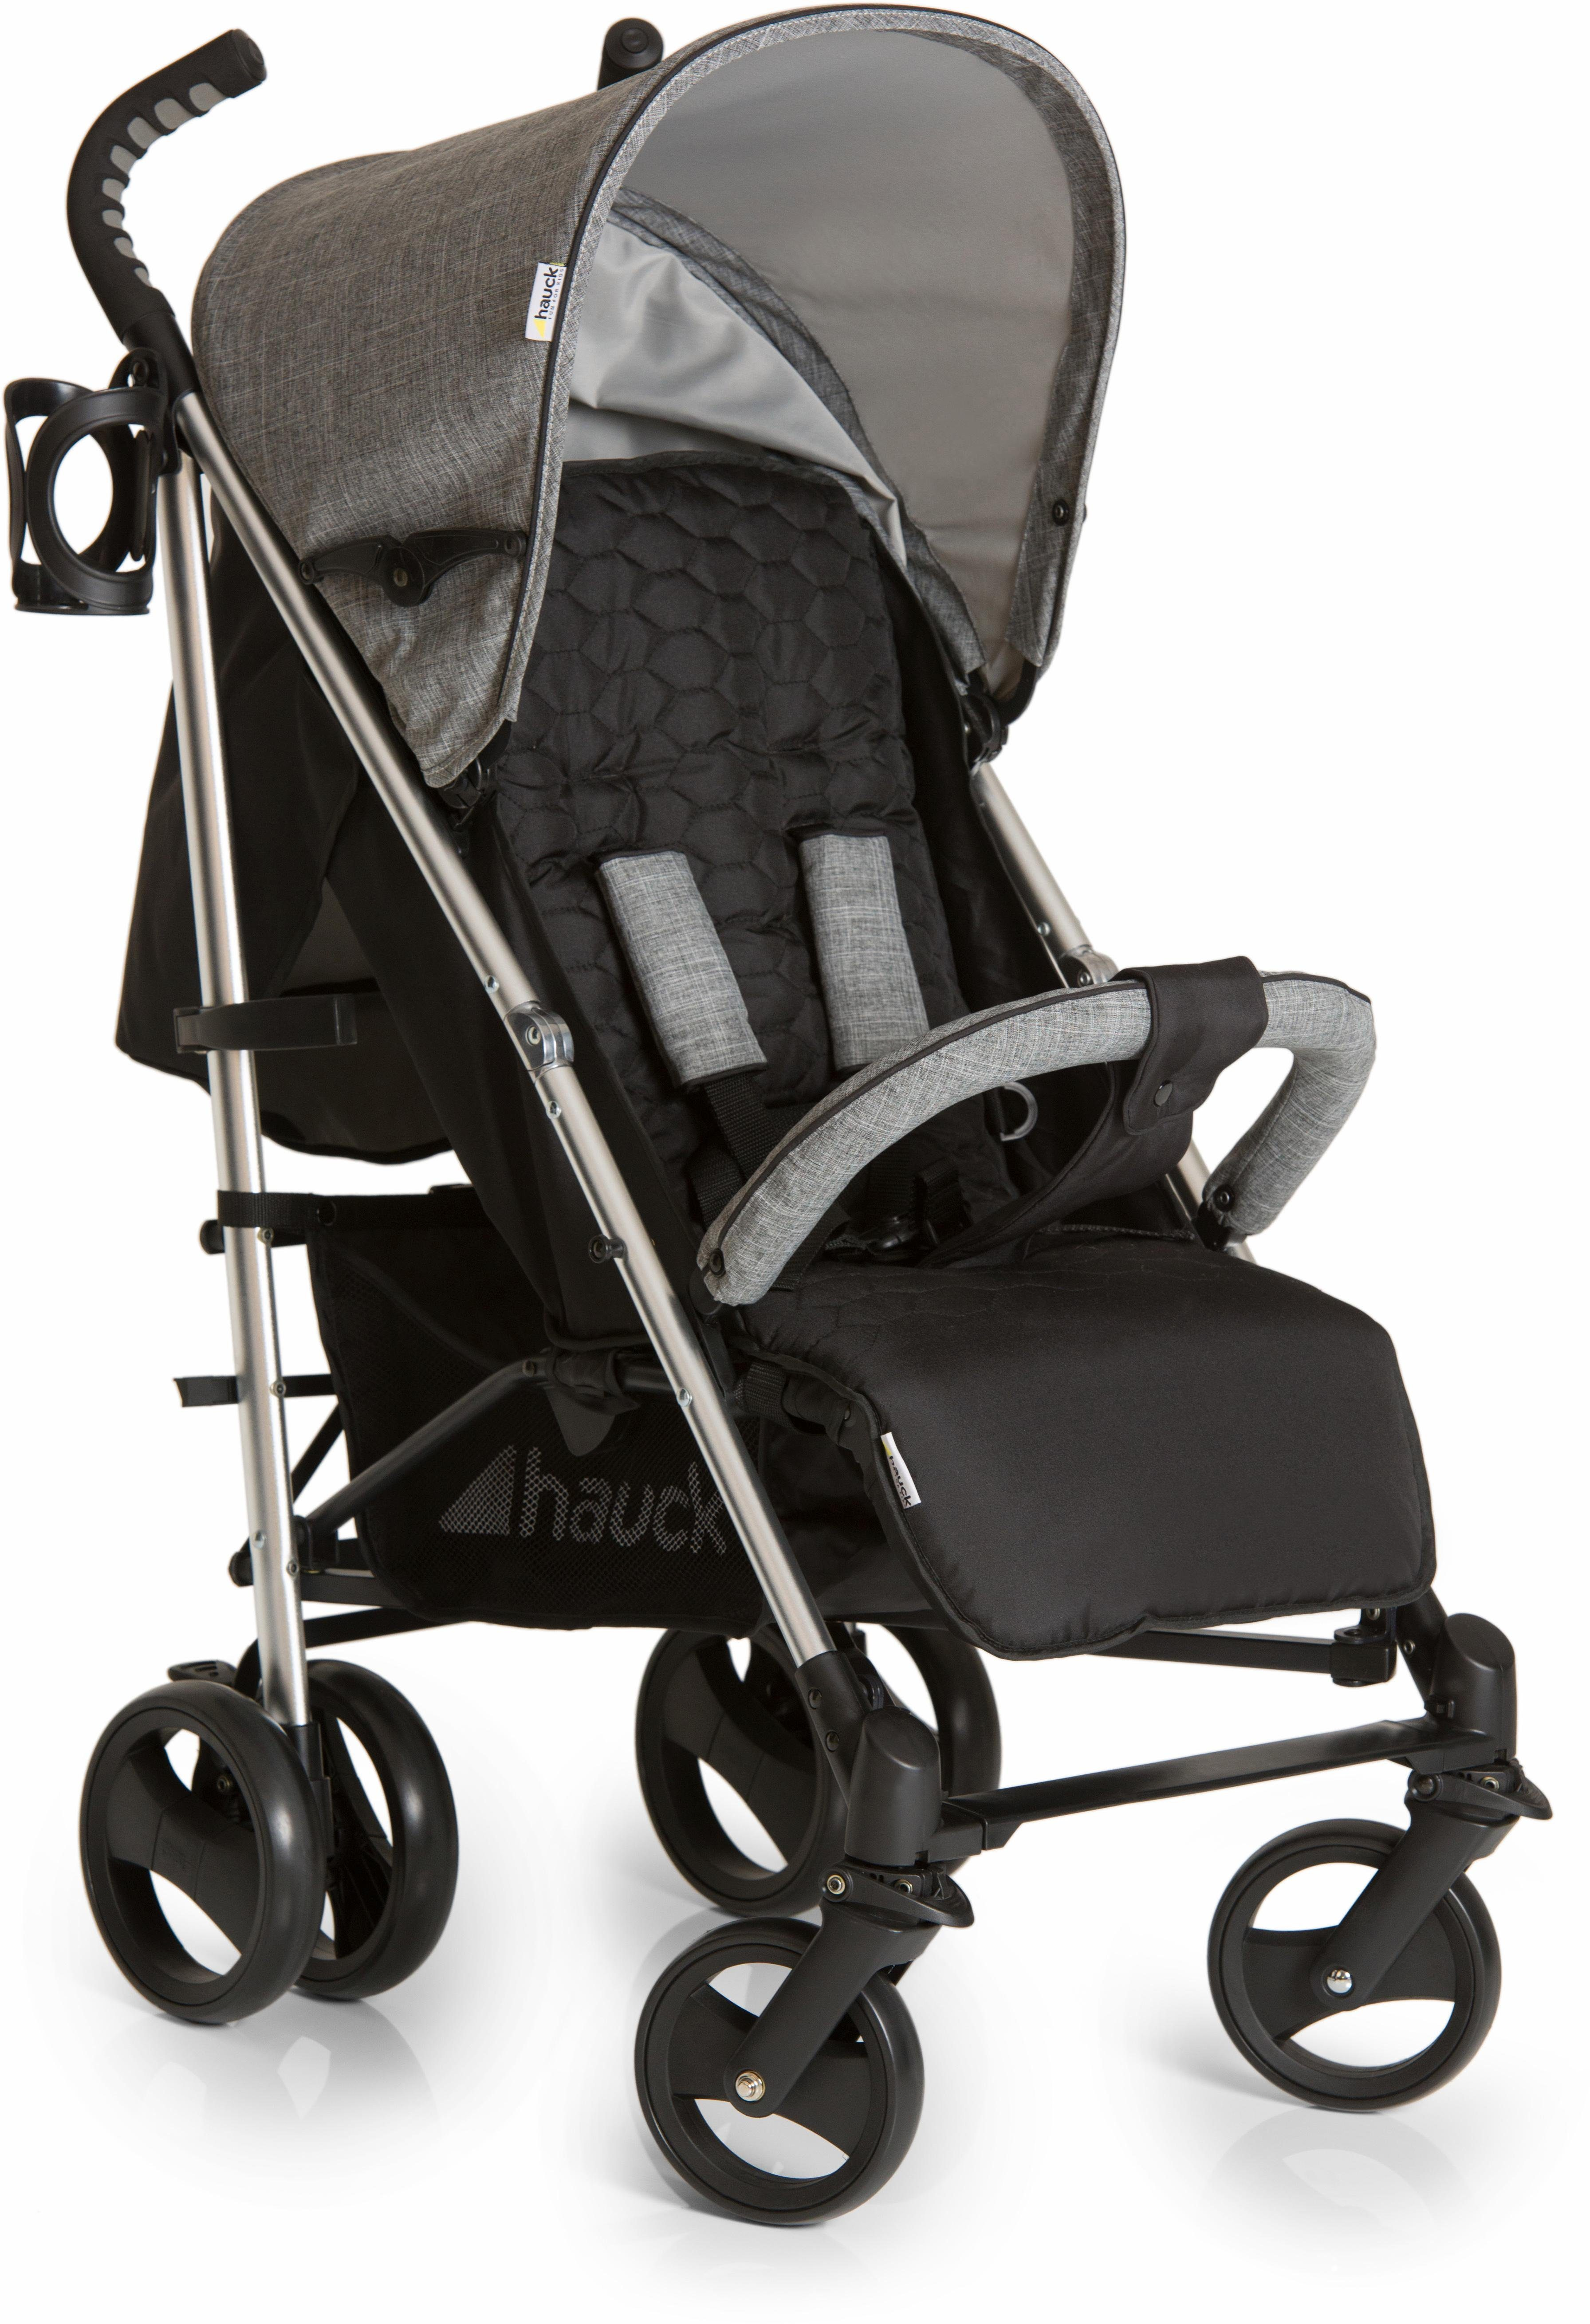 hauck FUN FOR KIDS Buggy mit leichtem Aluminiumgestell, »Vegas Melange Grey X«